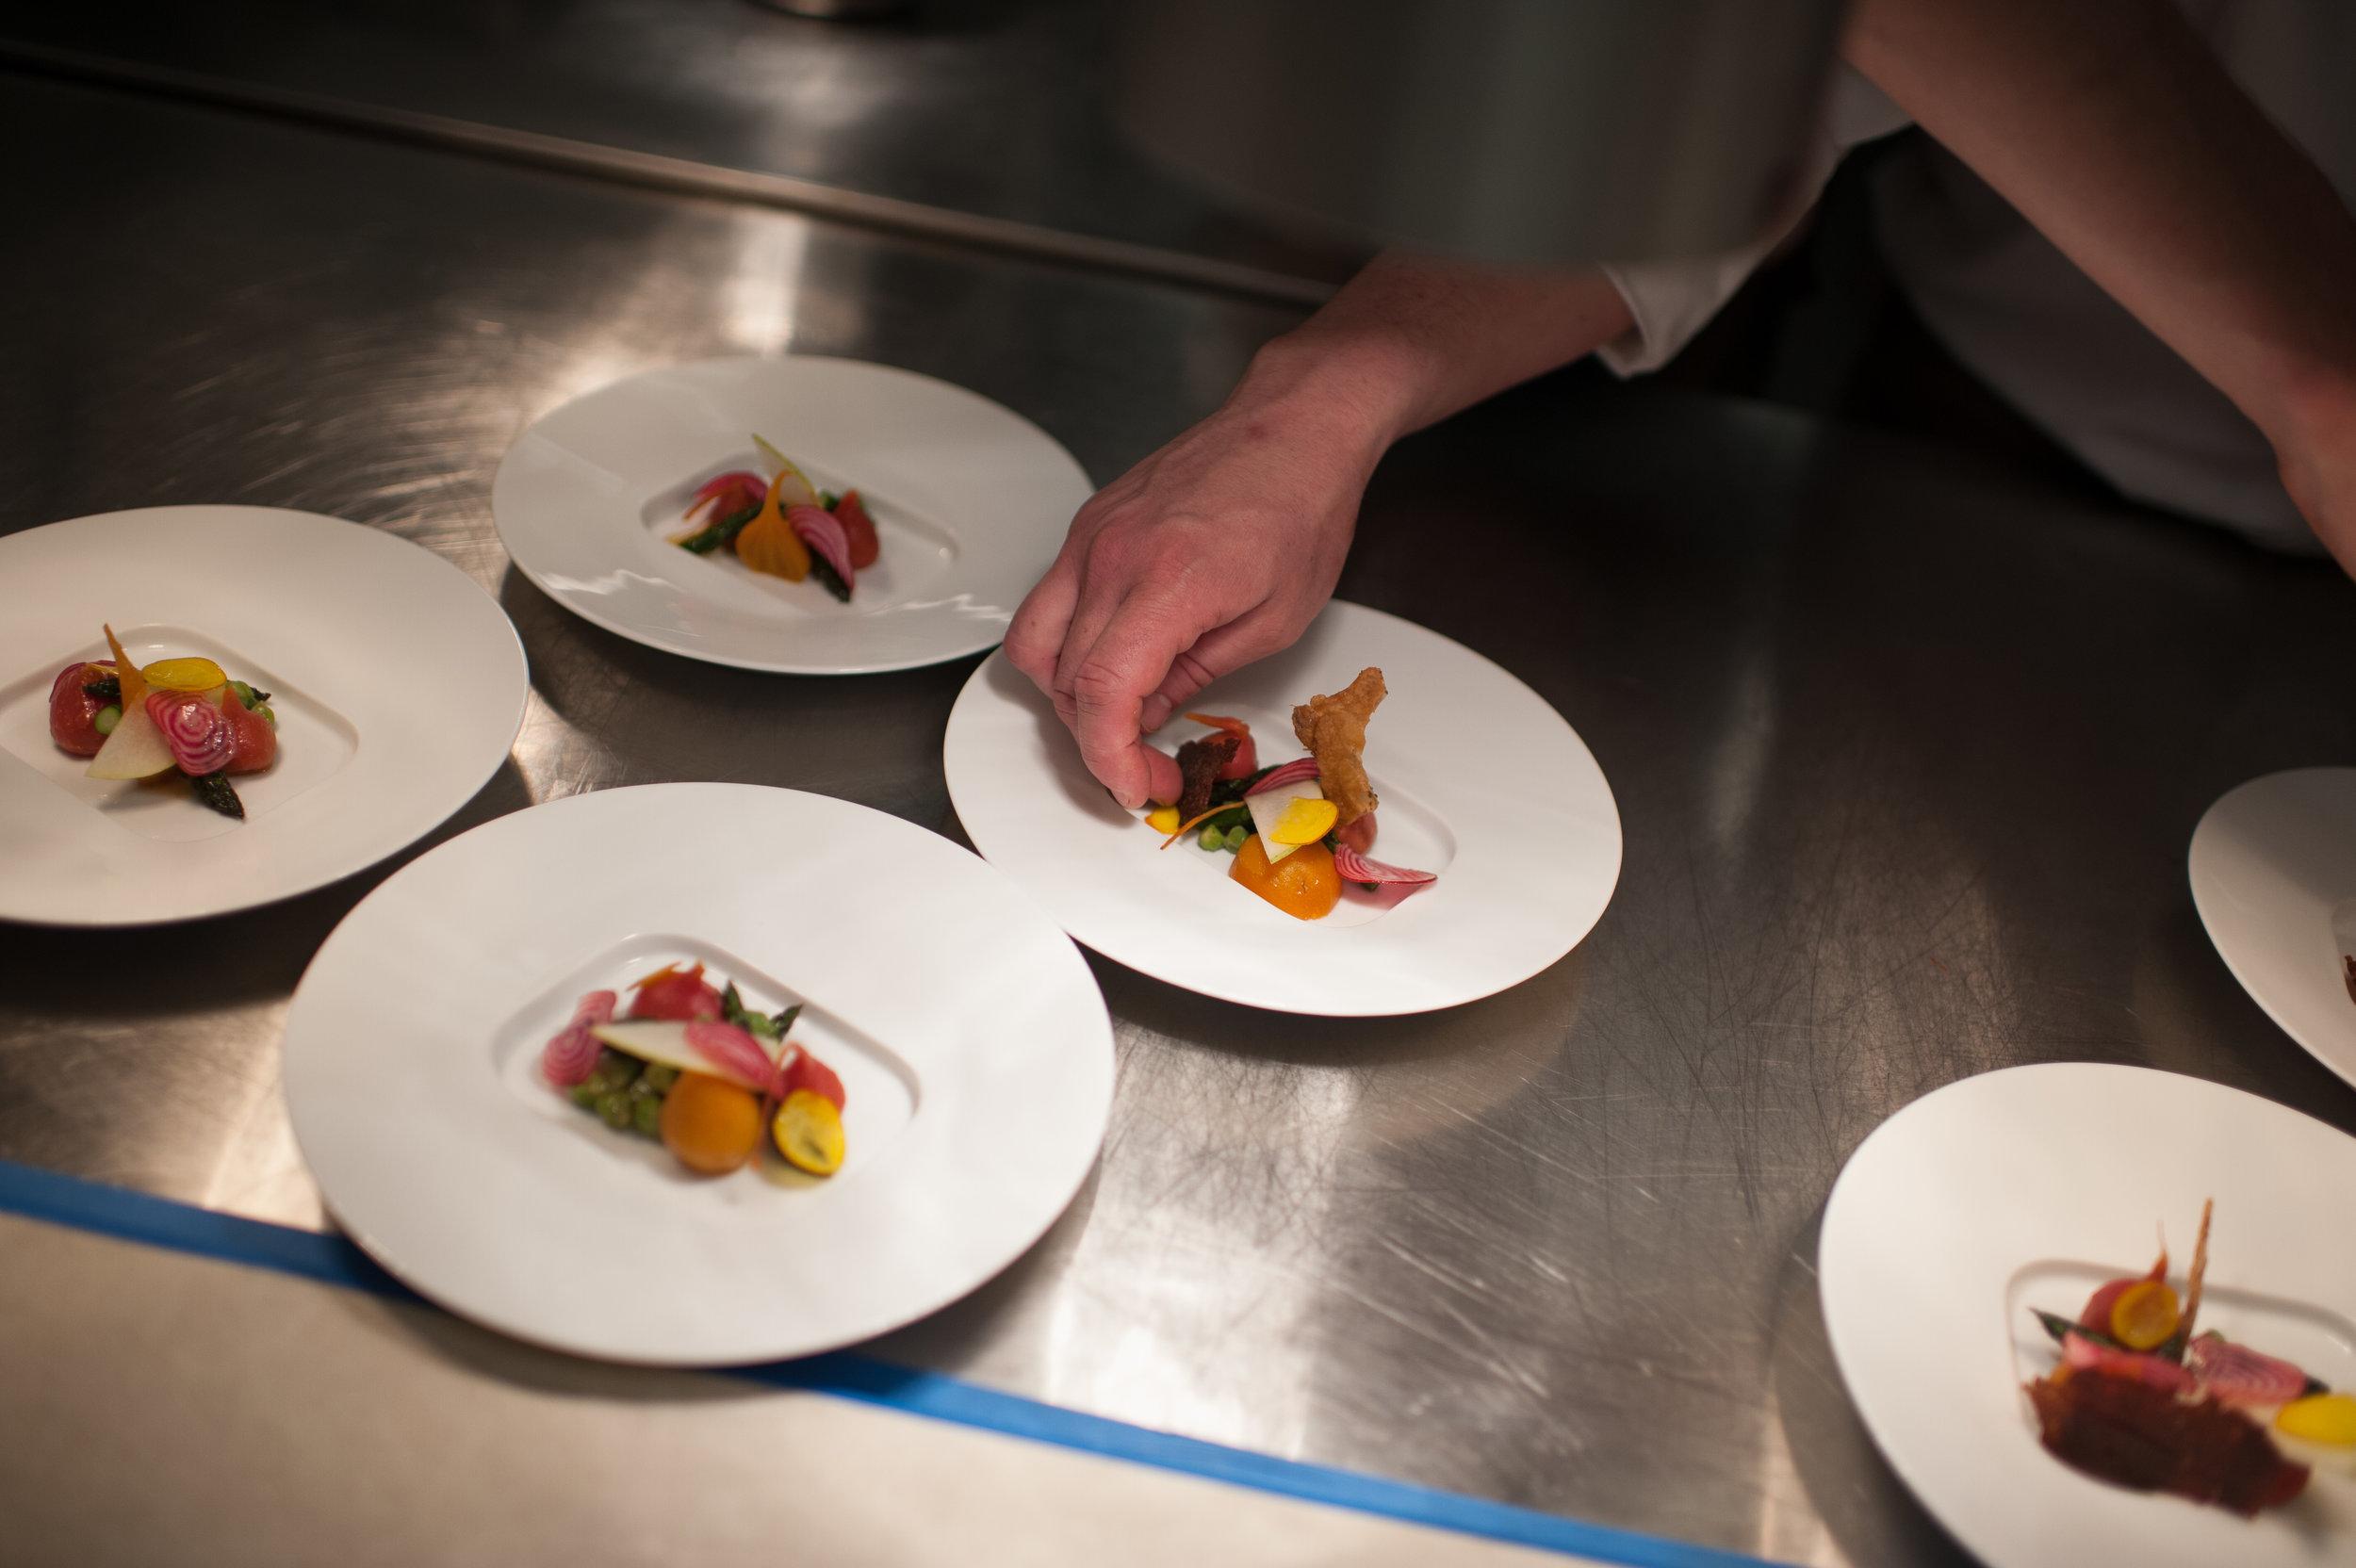 langdon-hall-wedding-food-chef.jpg